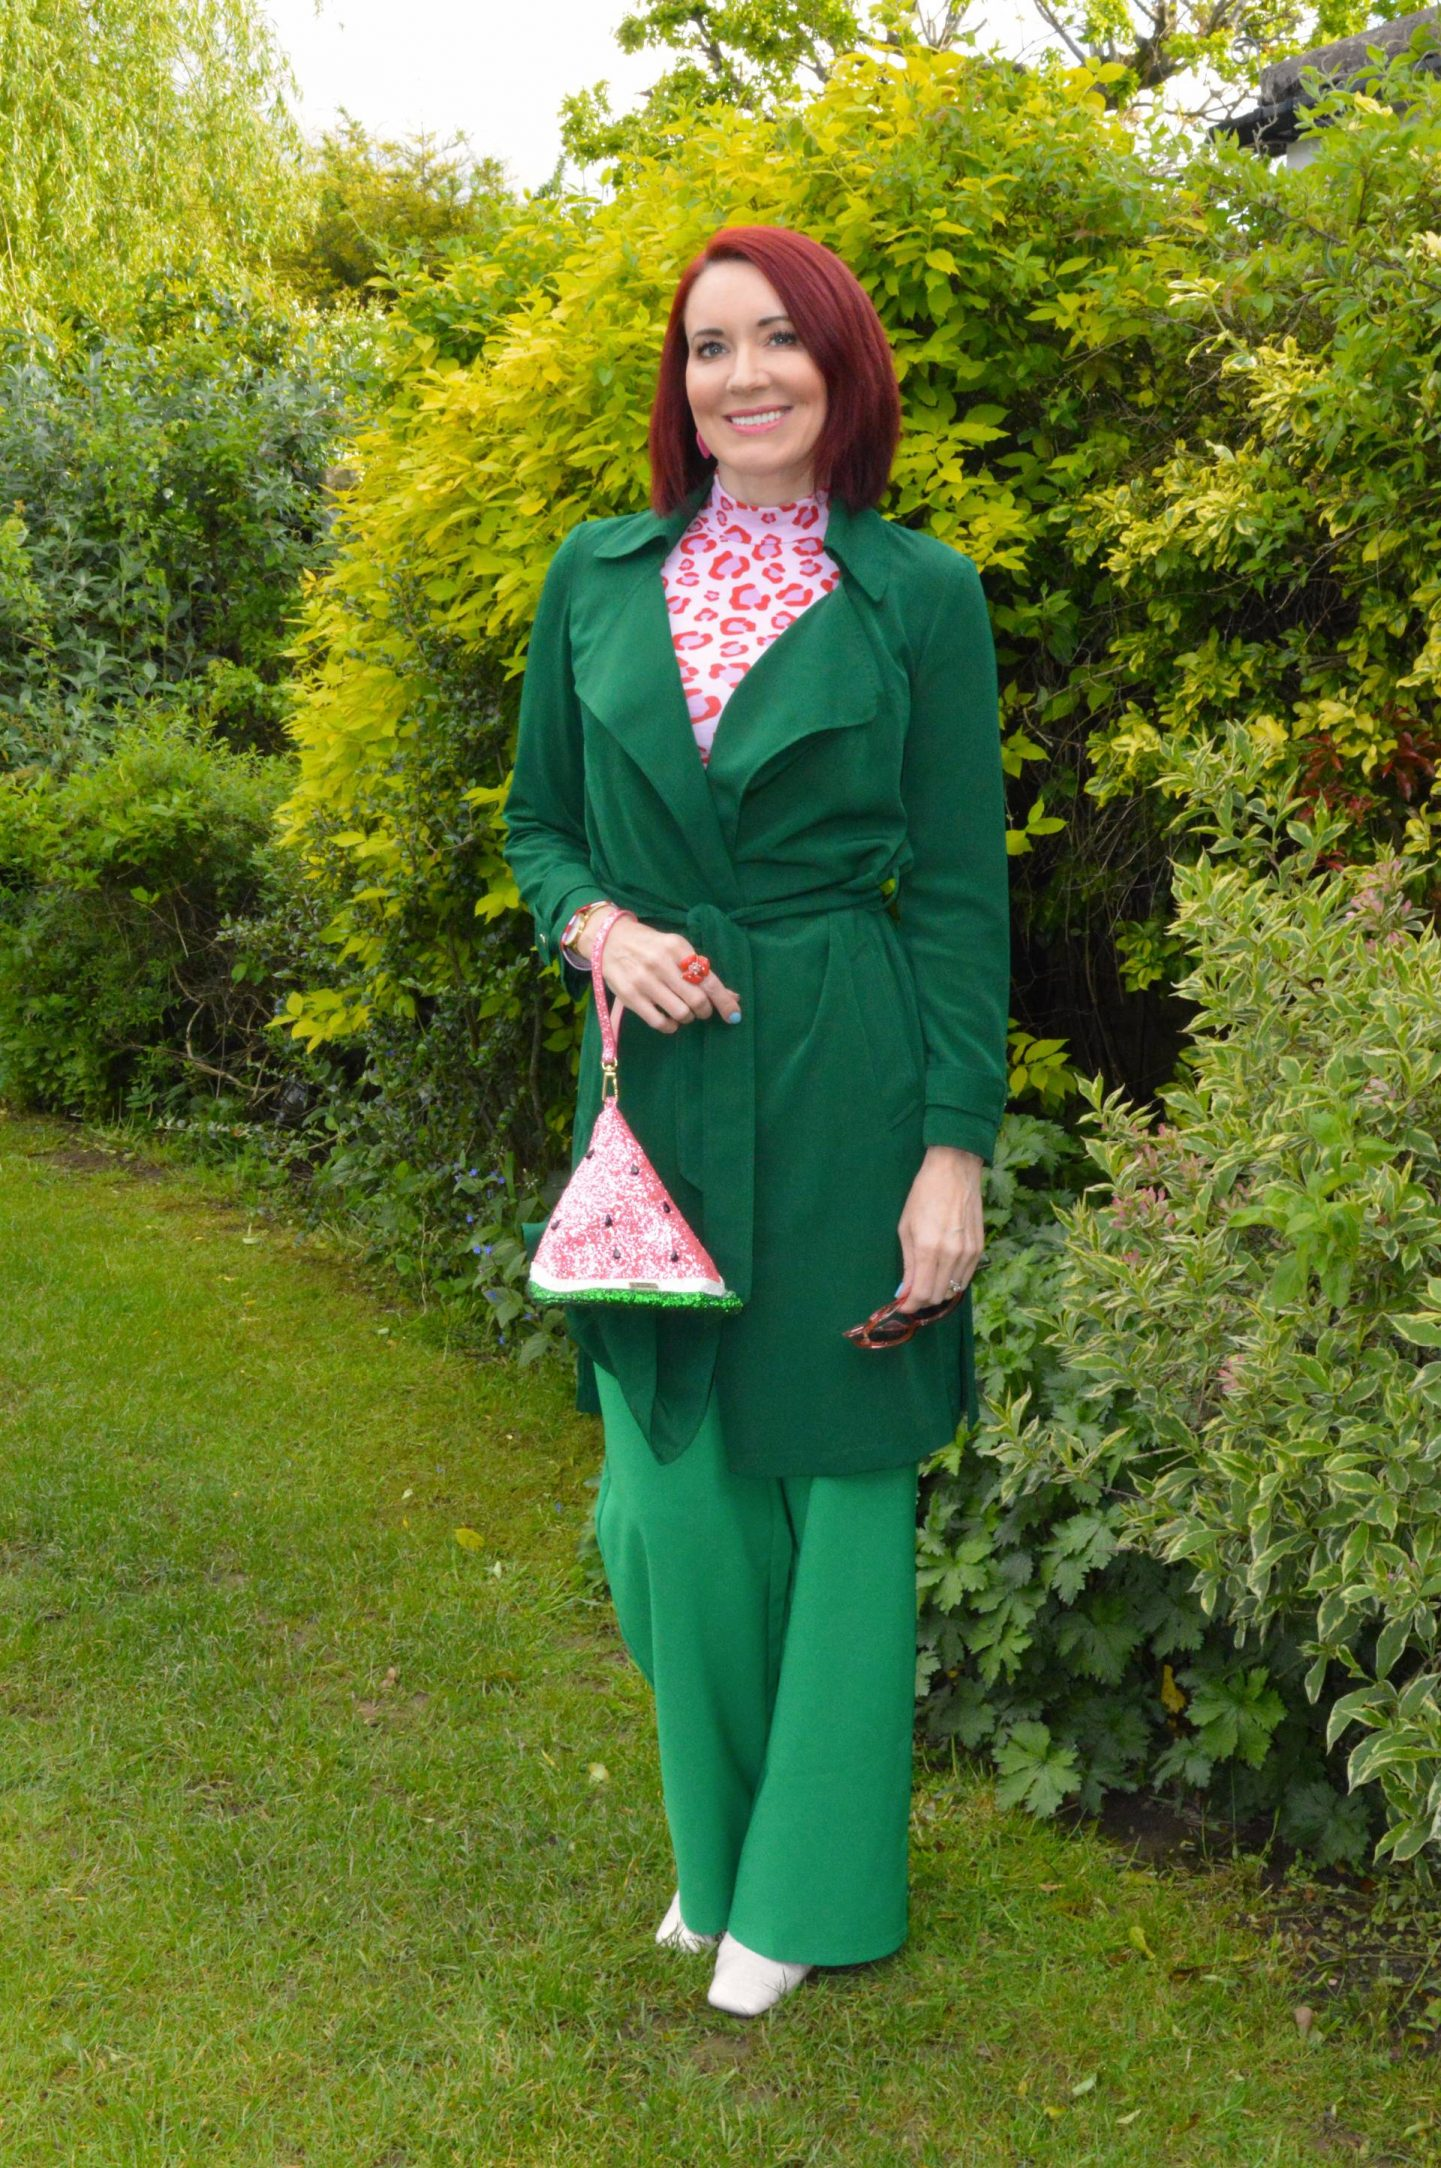 Green and Pink Animal Print, Saturday by Megan Ellaby Hazel pink animal print top, Skinny Dip glitter warermelon bag, Flounce emerald green trousers, Papaya green trench coat